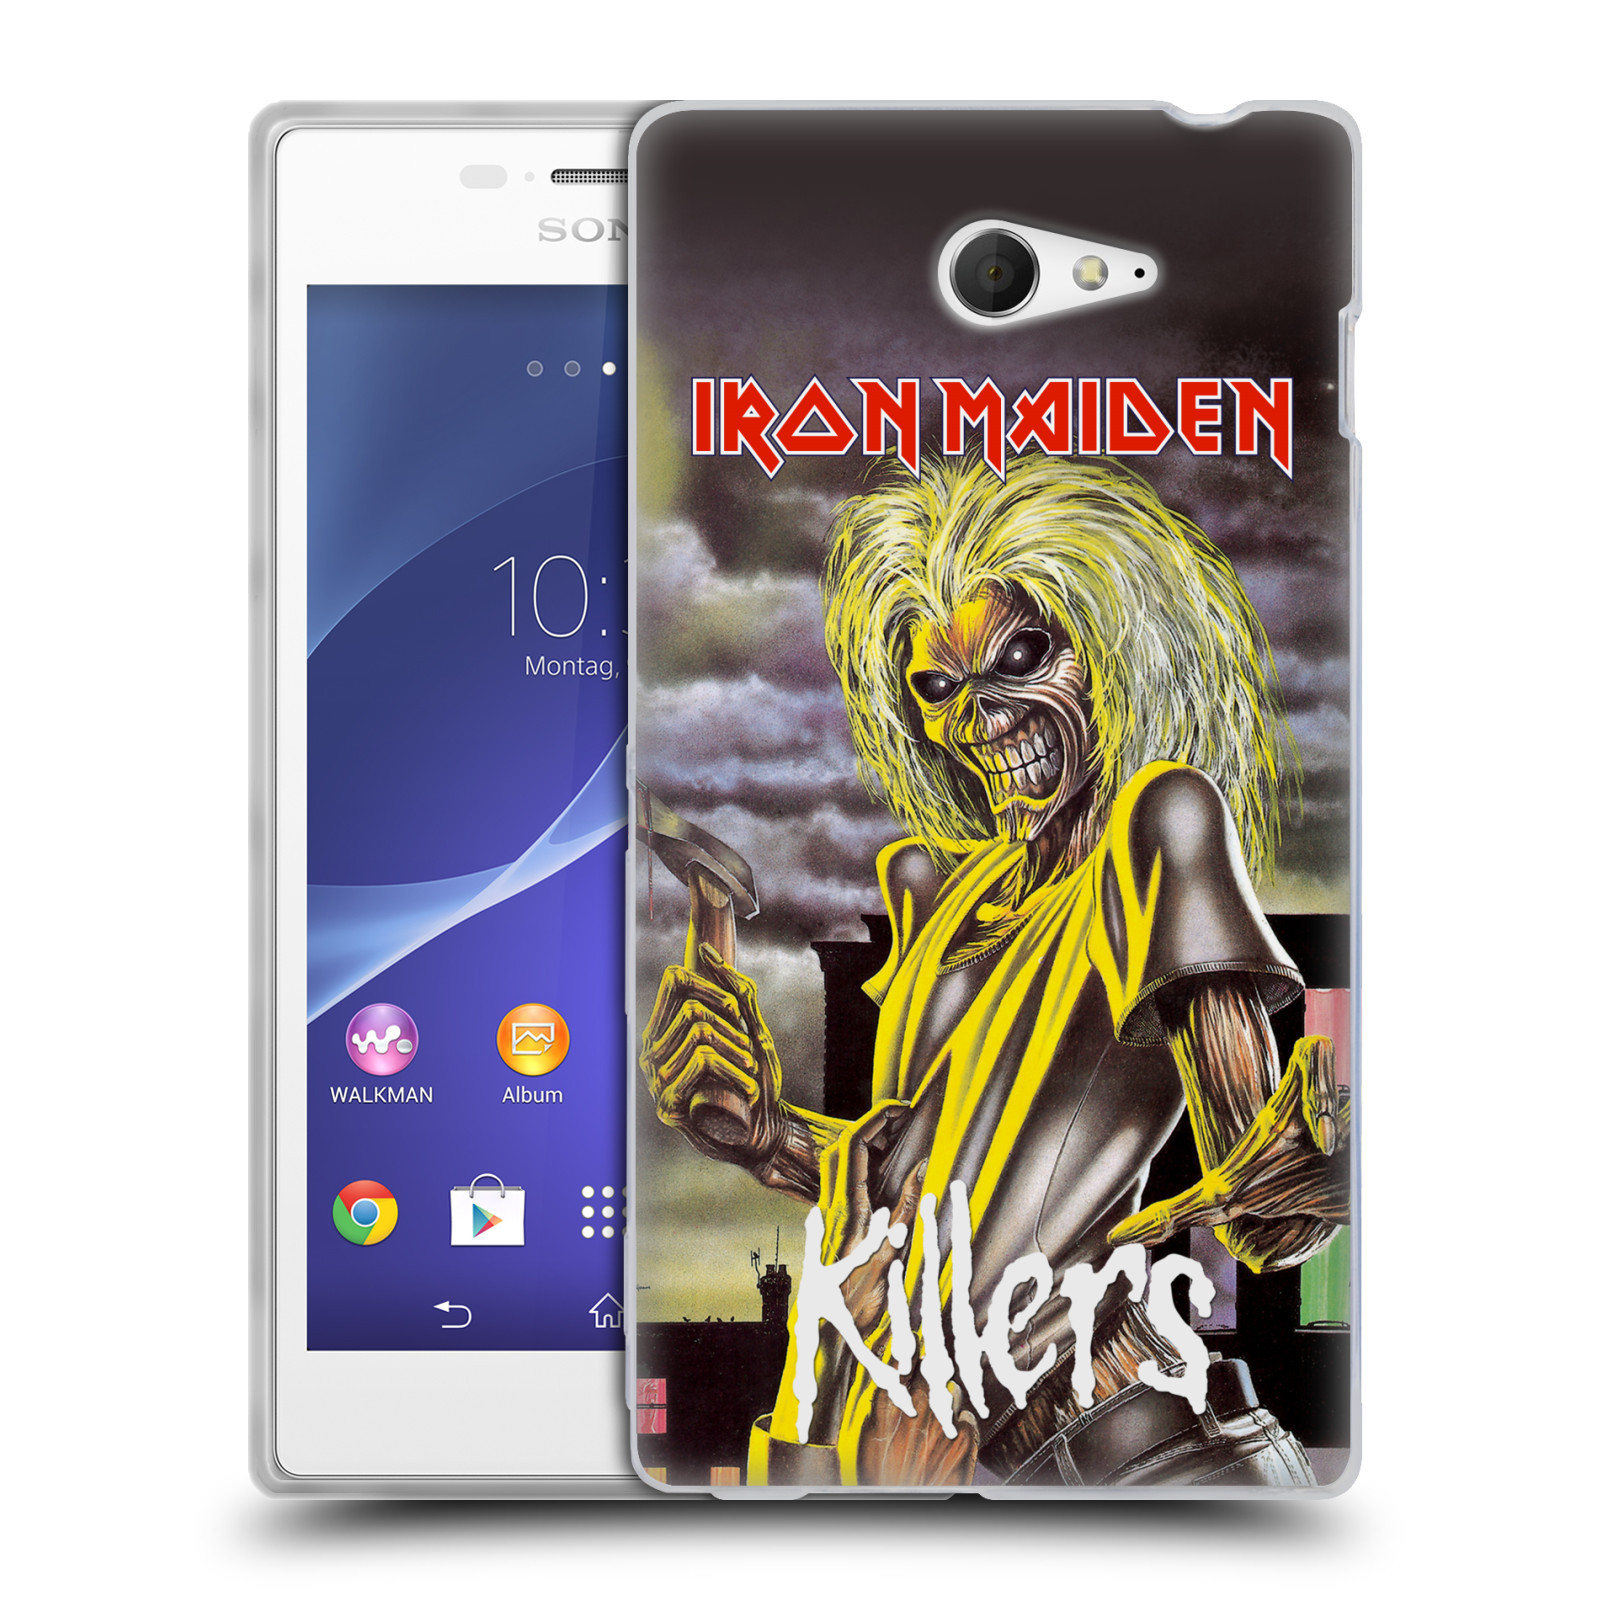 Silikonové pouzdro na mobil Sony Xperia M2 D2303 HEAD CASE - Iron Maiden - Killers (Silikonový kryt či obal na mobilní telefon s licencovaným motivem Iron Maiden Sony Xperia M2)